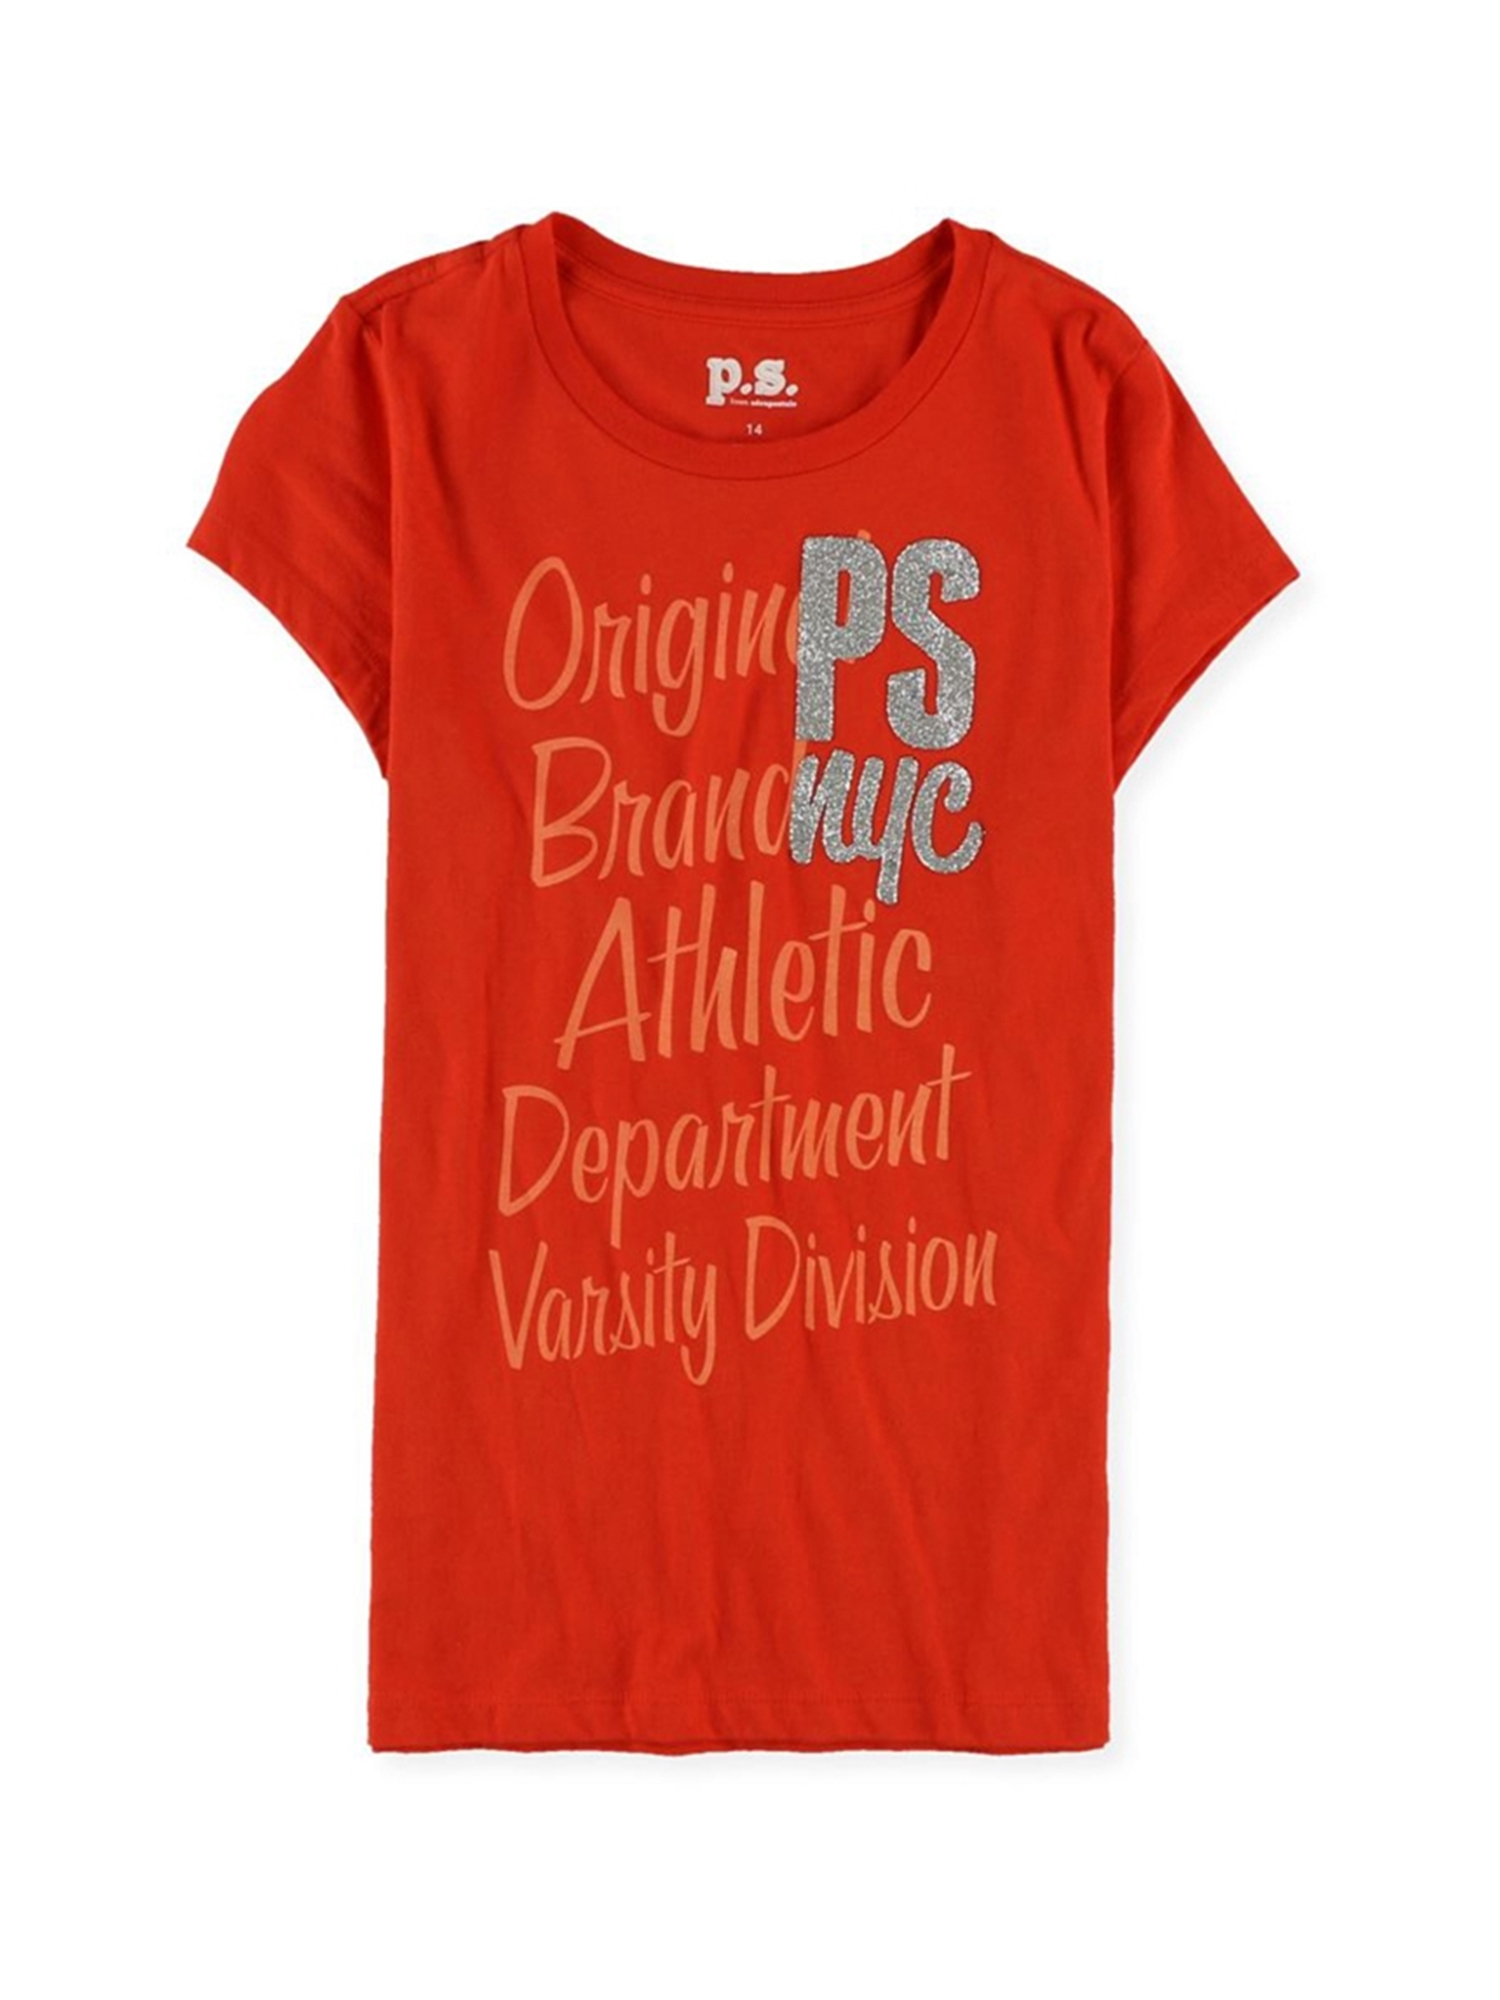 Aeropostale Girls Glitter Nyc Graphic T-Shirt